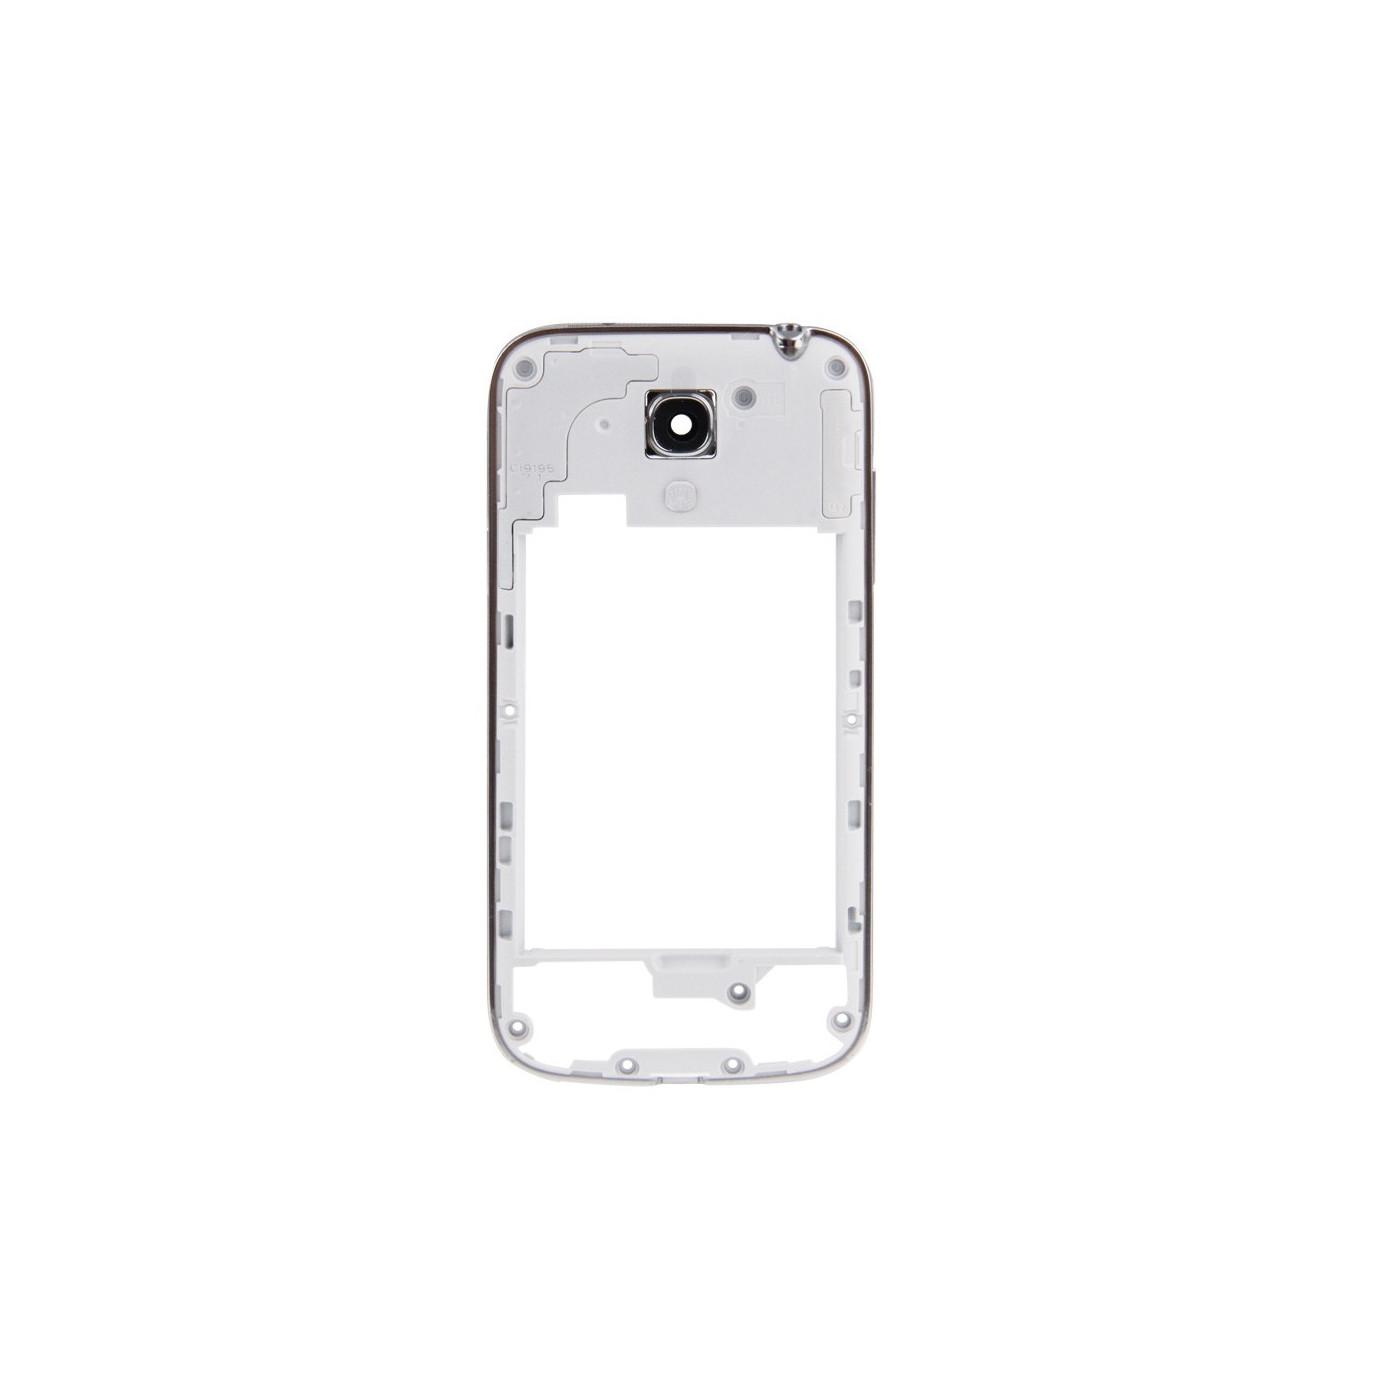 Cadre cadre cadre Samsung S4 mini i9195 / i9190 bordure argentée